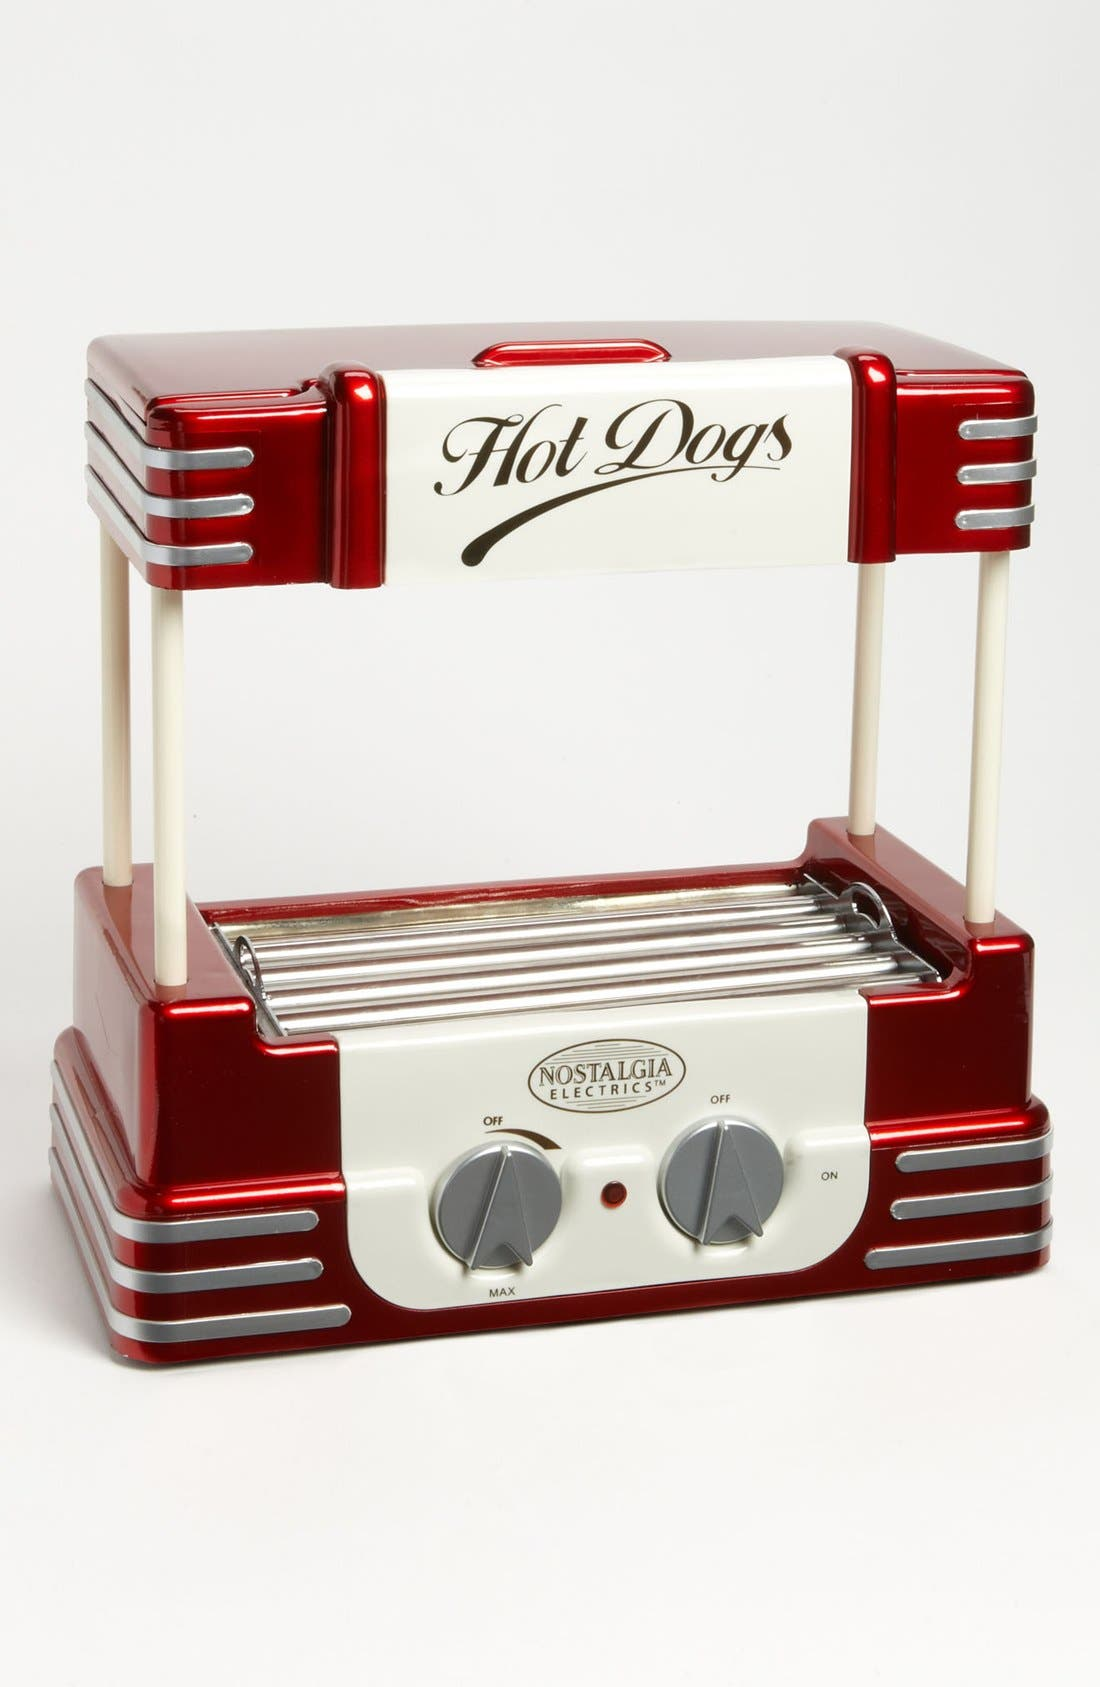 Alternate Image 1 Selected - Retro Hot Dog Roller